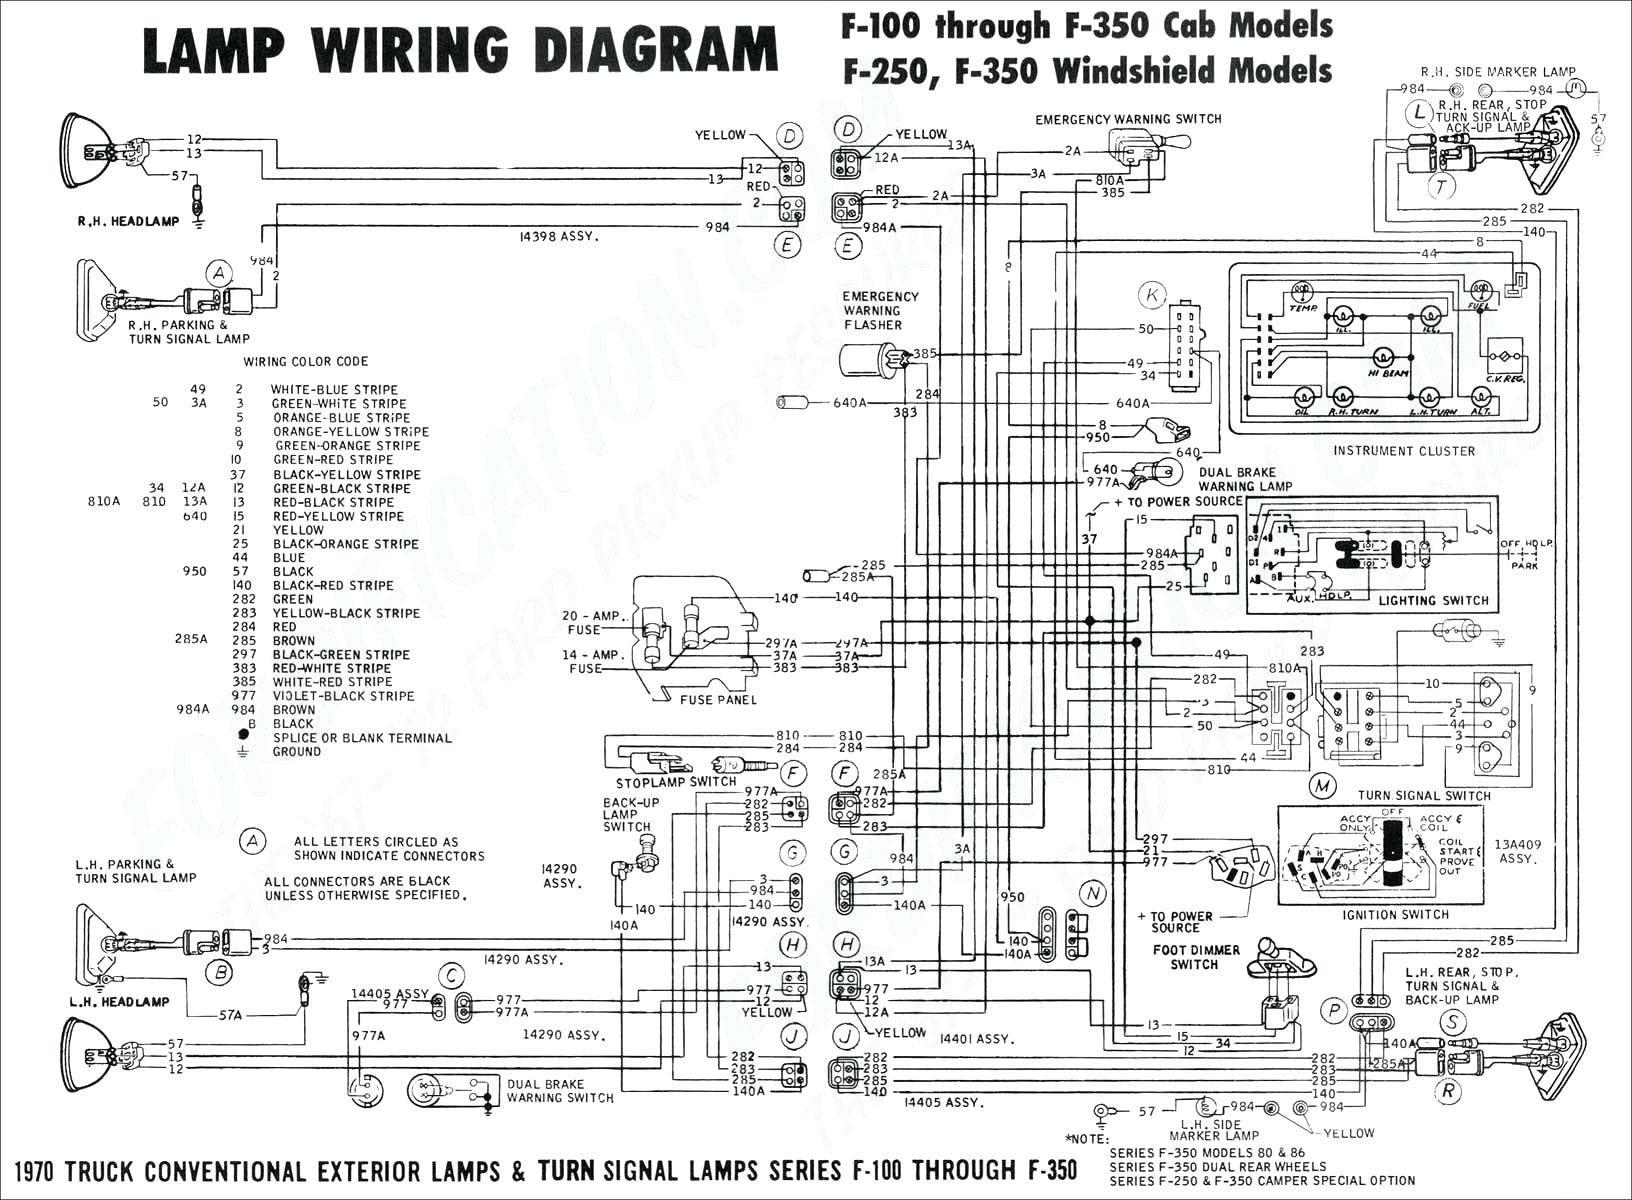 2000 ford F250 Rear Tail Light Wiring Pool Light Wiring Diagram Of 2000 ford F250 Rear Tail Light Wiring